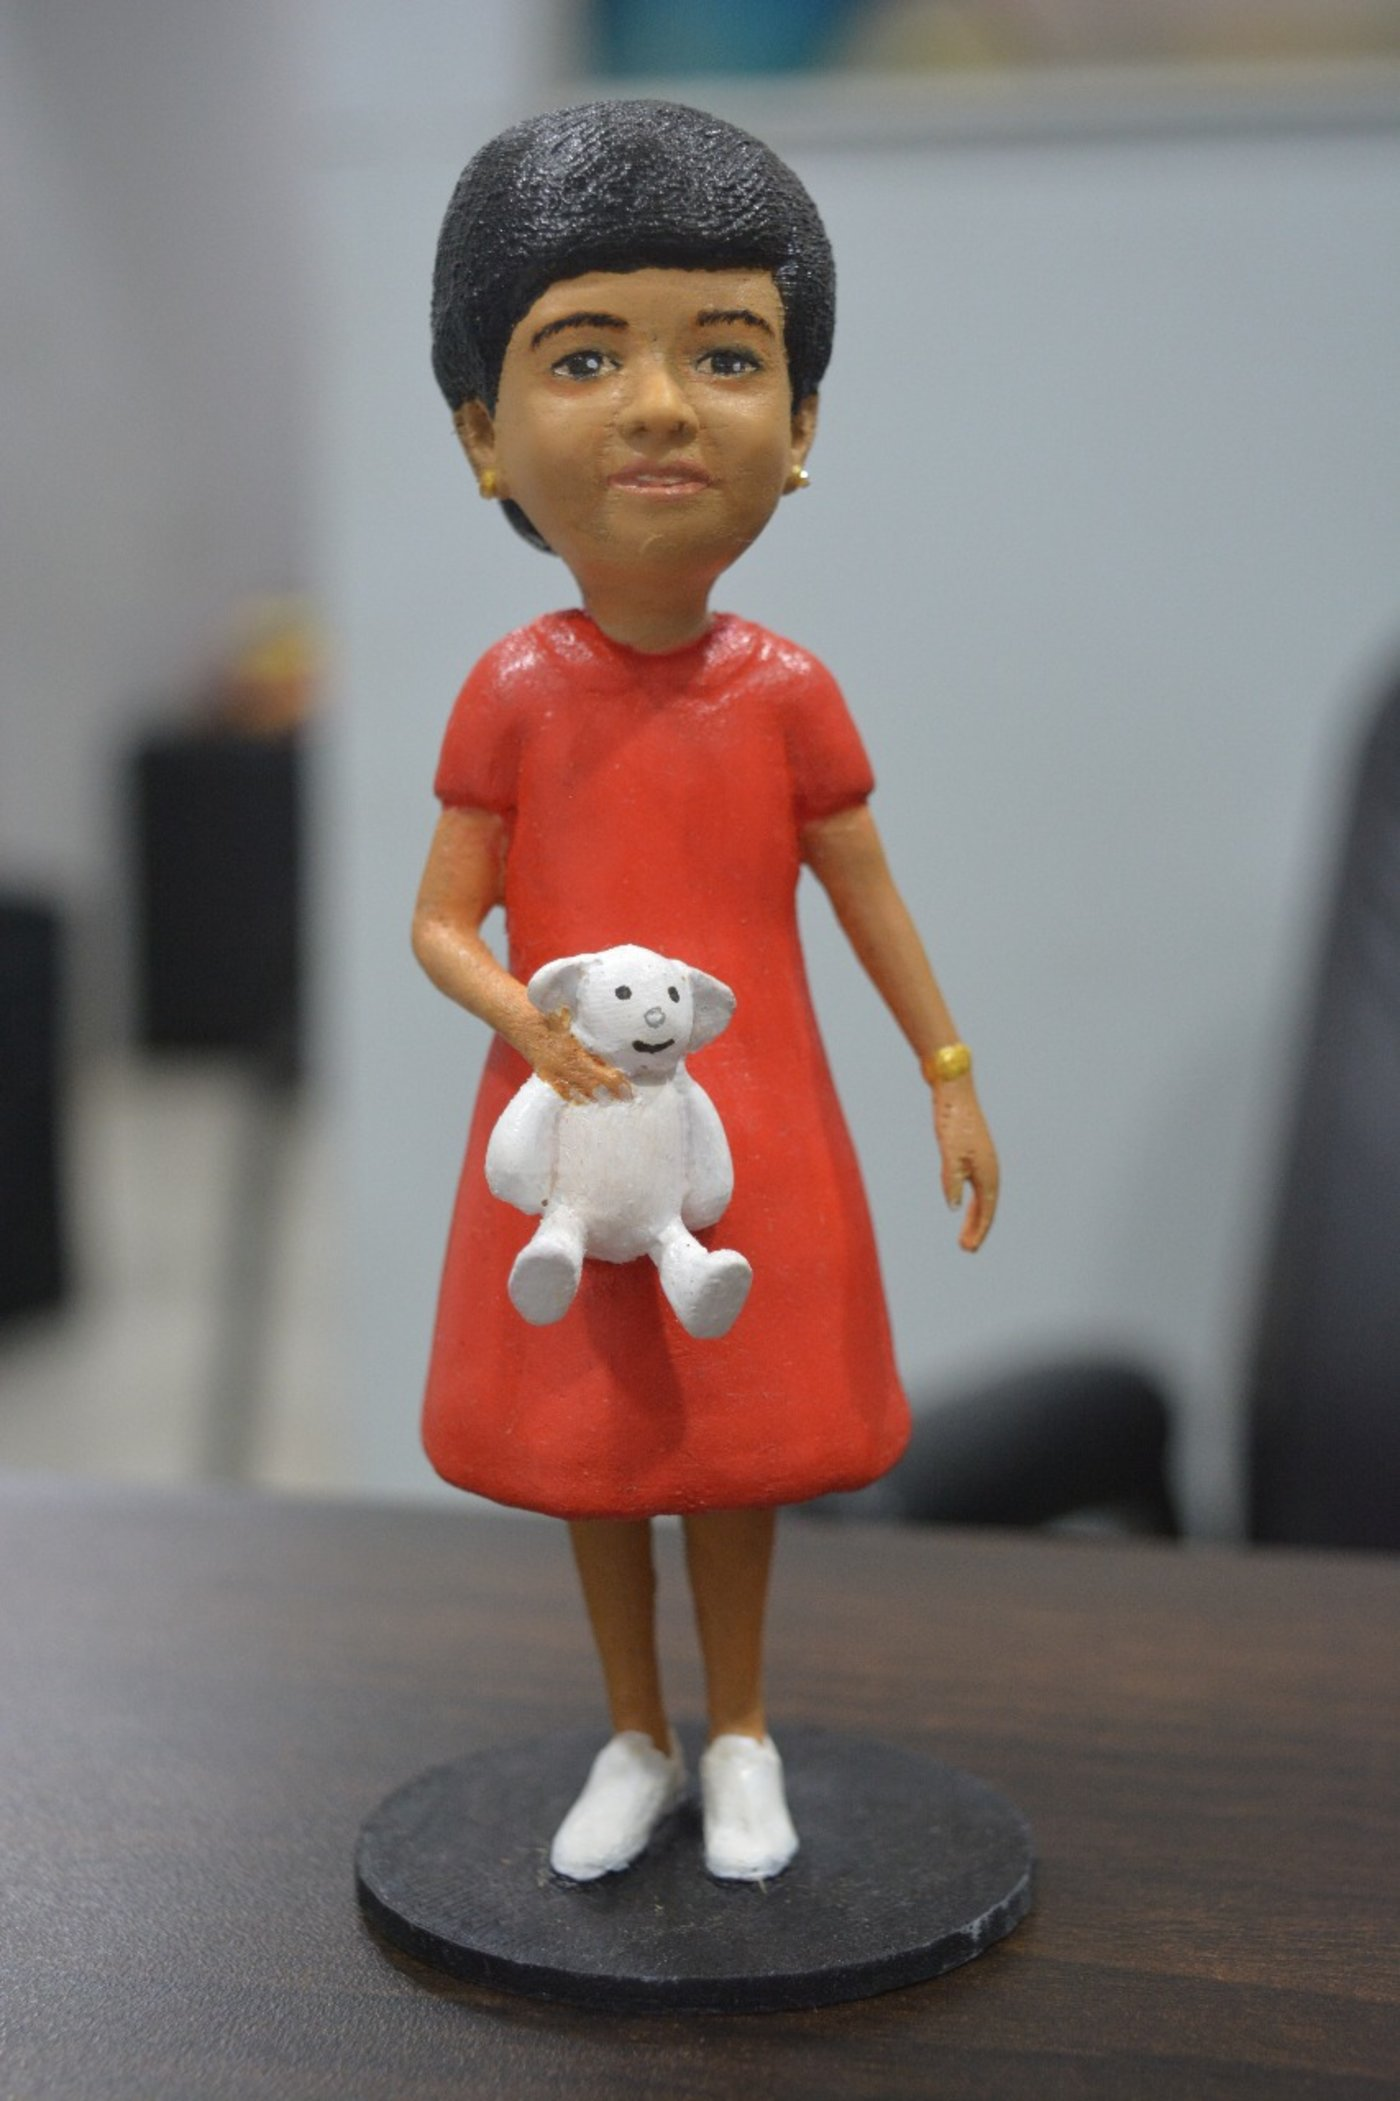 3d human models 3d printed from 2d photo 3d